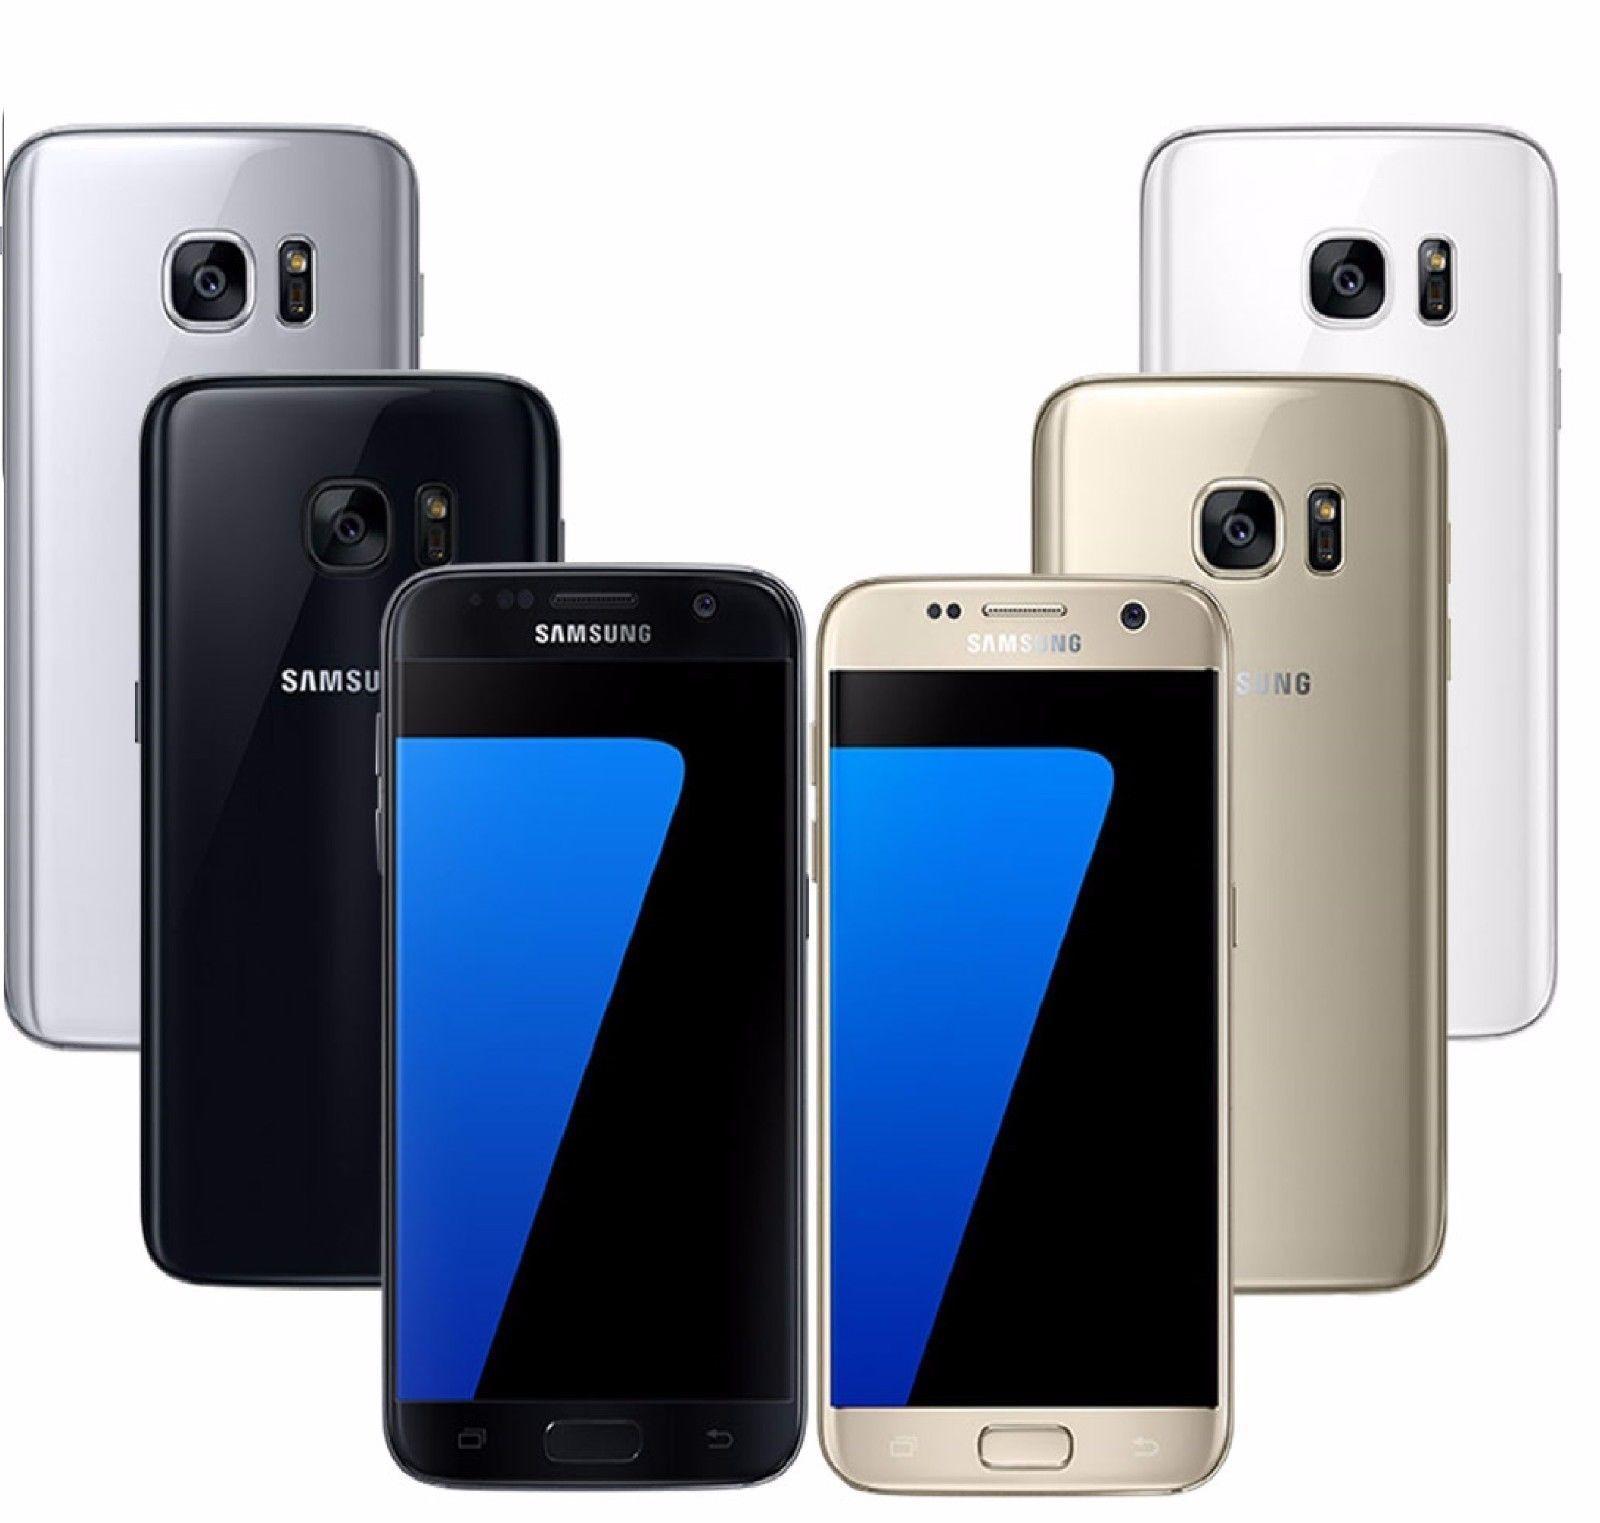 Best Clone Samsung Galaxy S7/S7 Edge SM-G930FD Copy Replica Factory